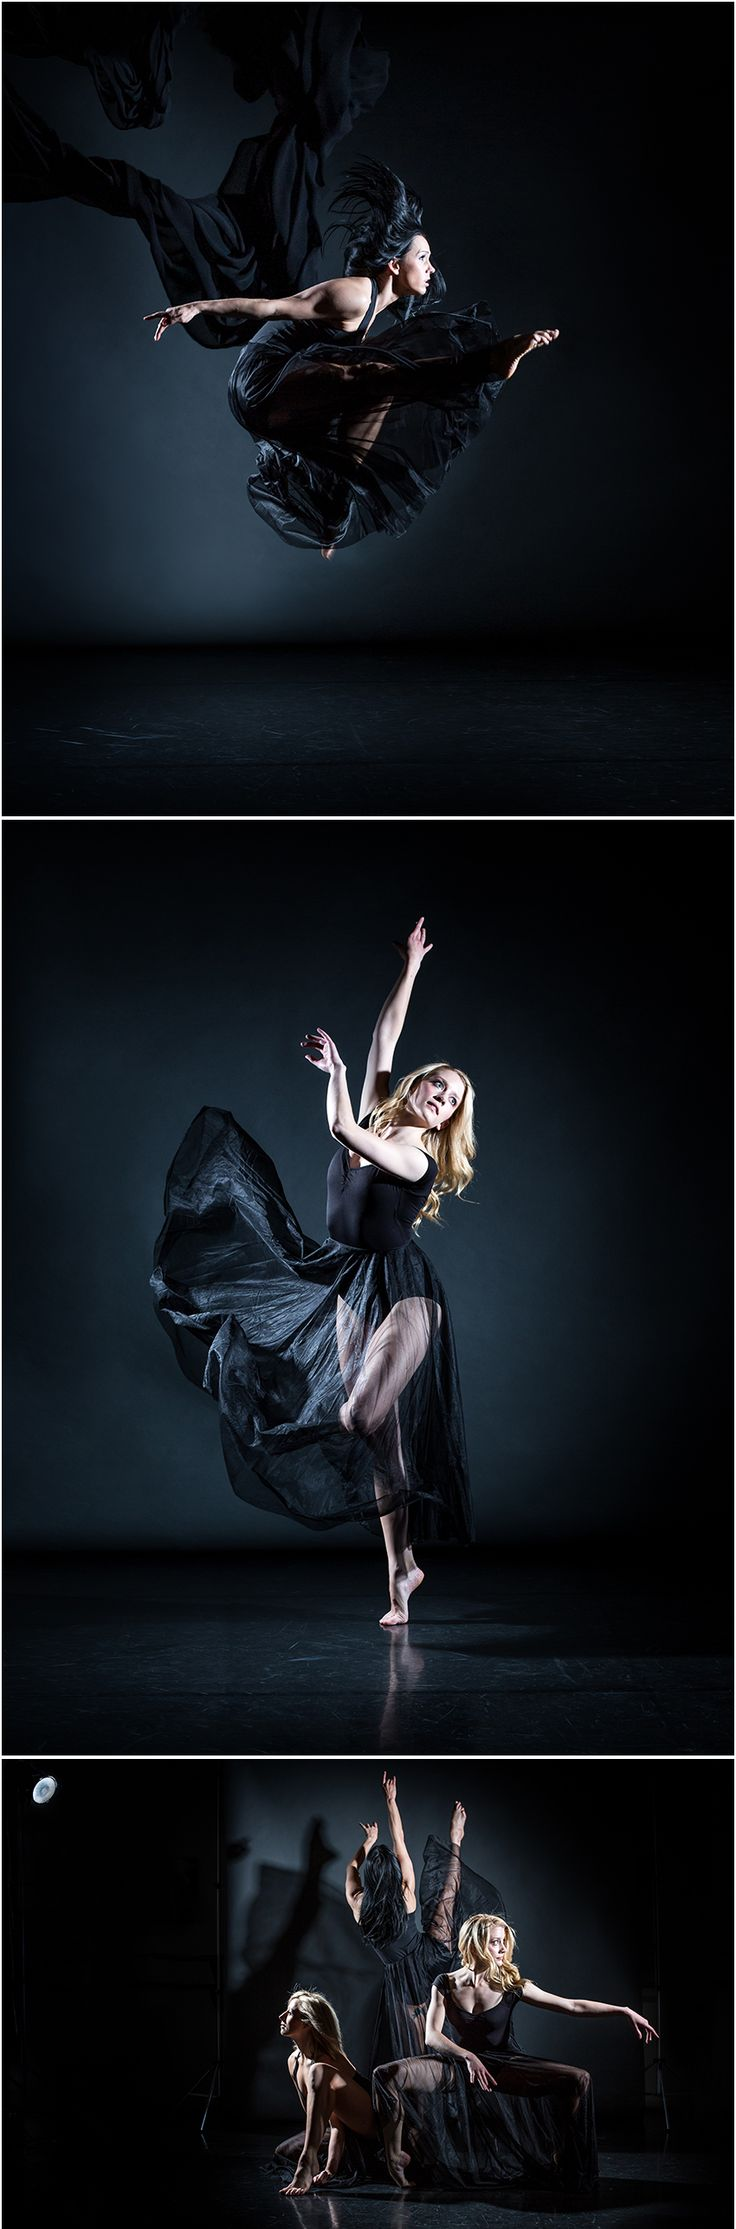 Alexis McKeown shoot with Viva Dance Co. from Edmonton, AB -  alexismckeown.com  |  vivadancecompany.com  #dance #dancephotography #dancelife #alberta #yeg  #alexismckeown #photography